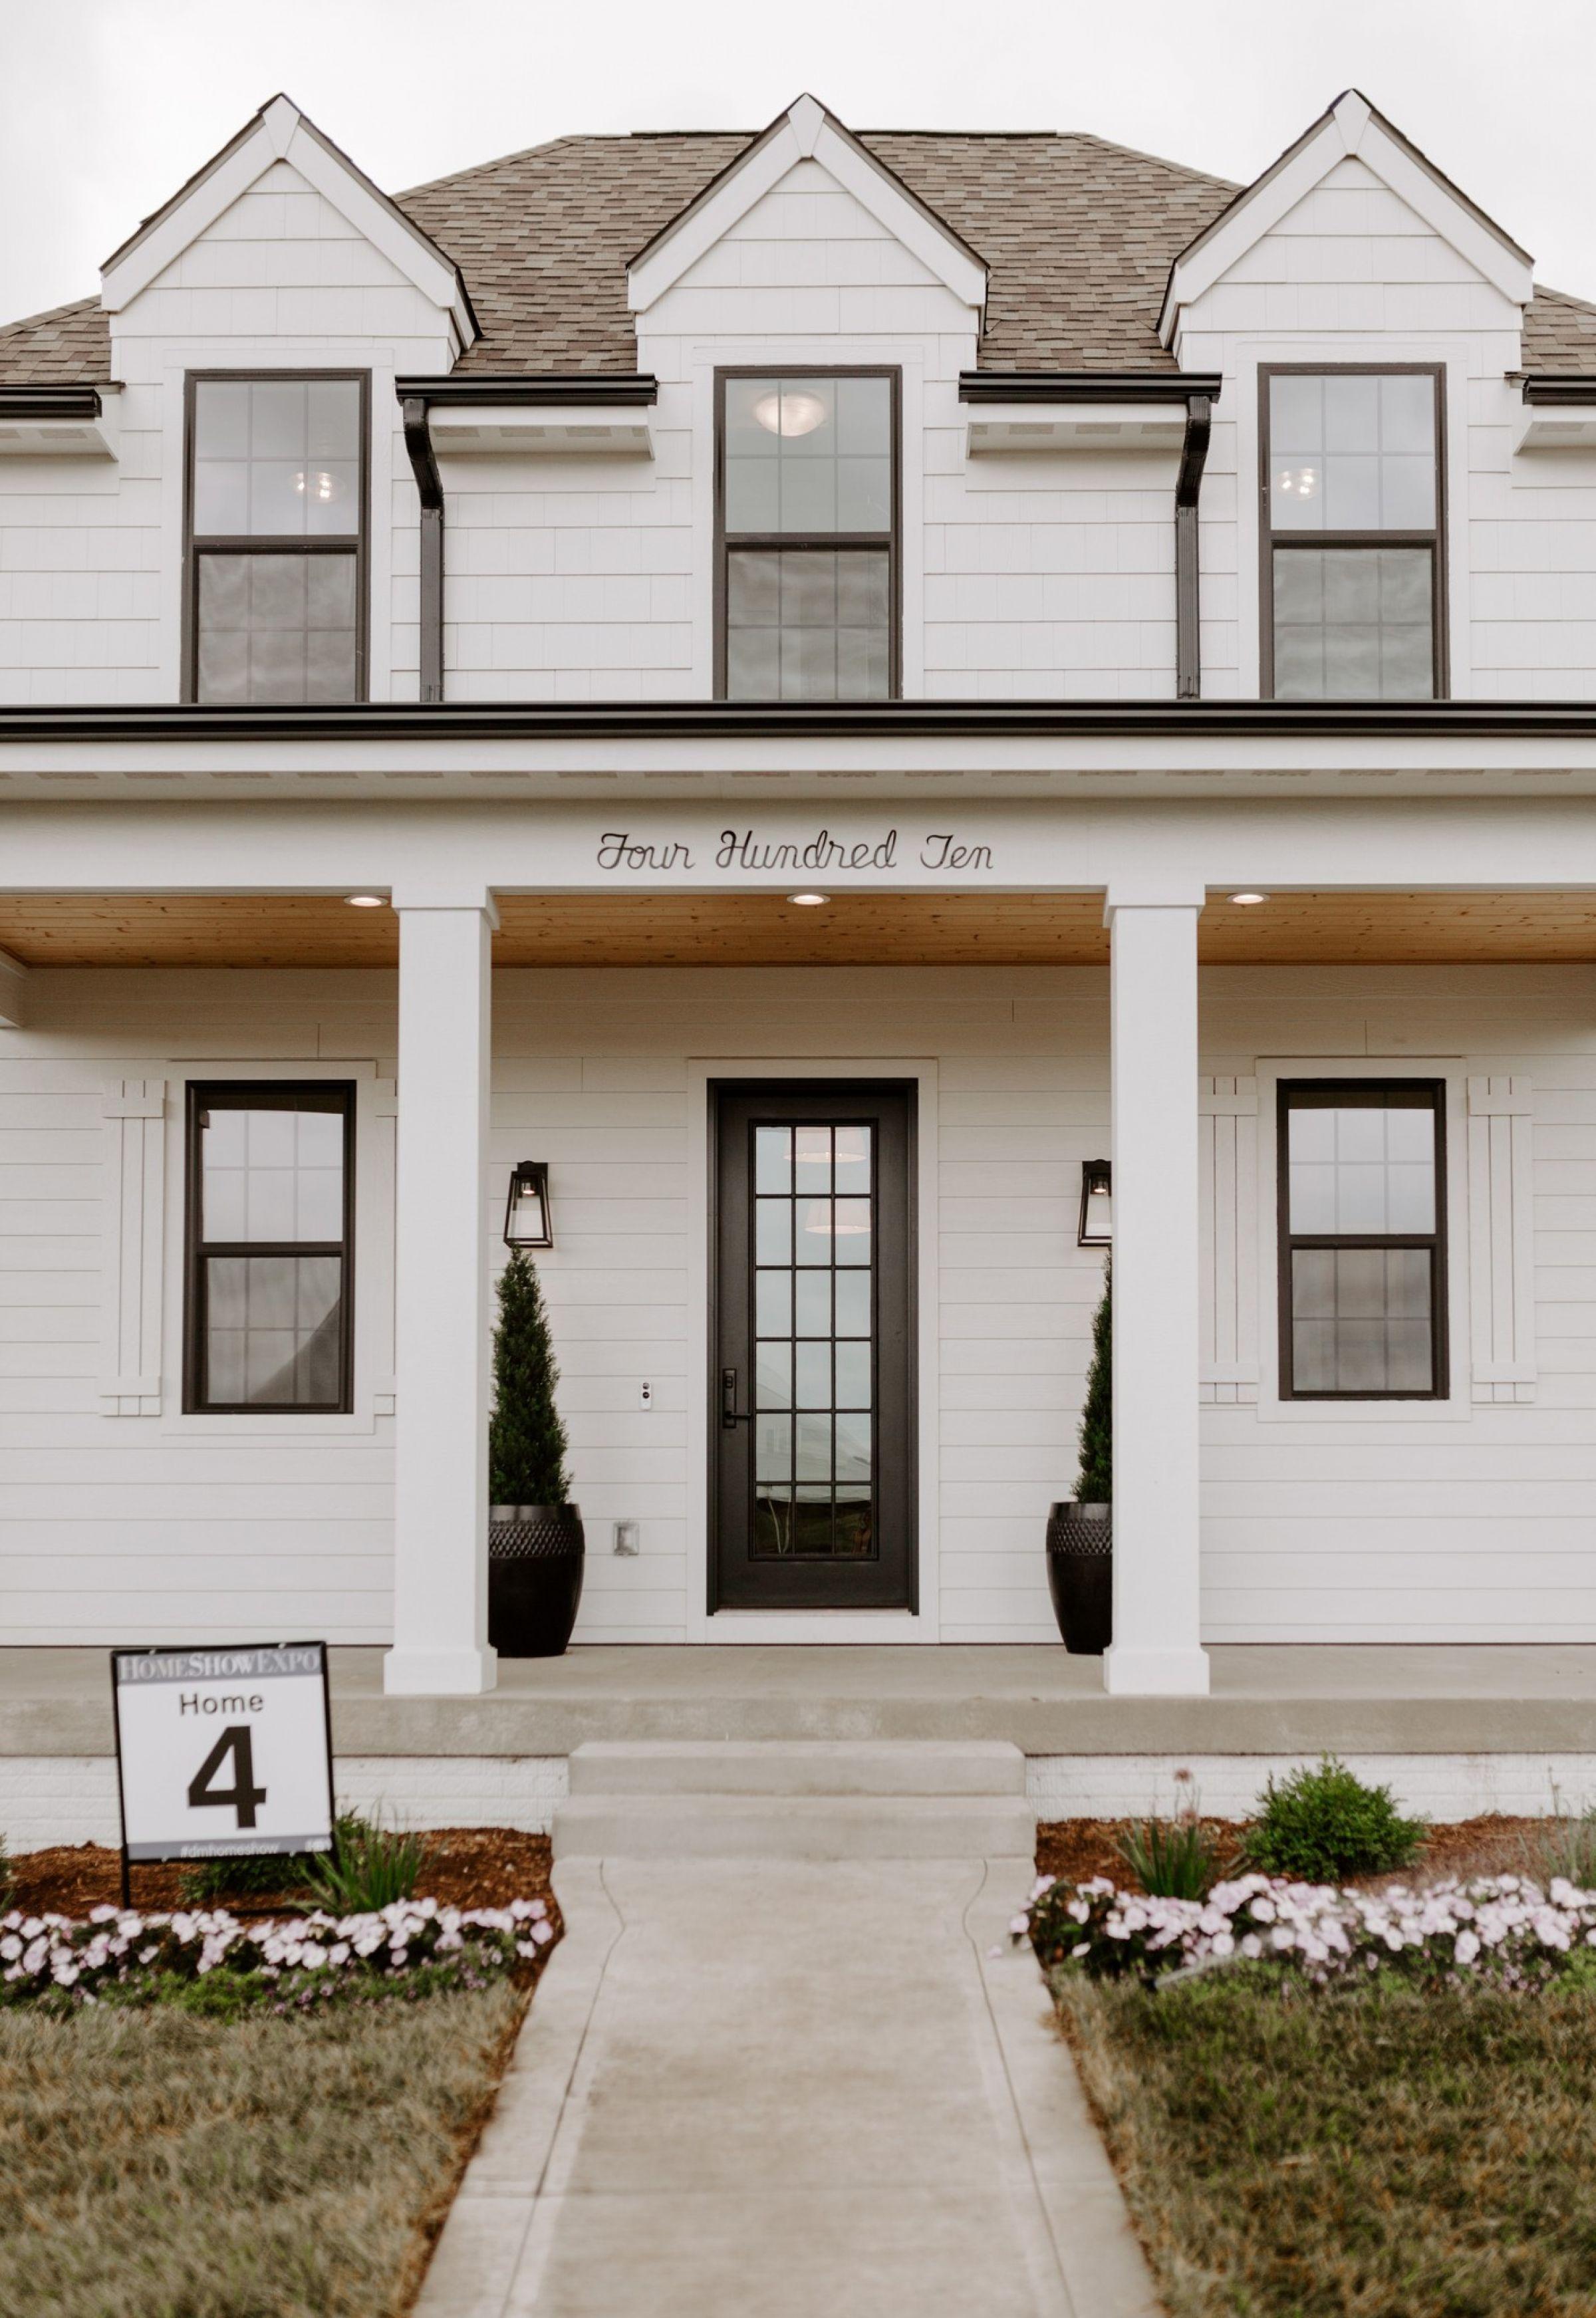 residential-warren-county-iowa-1-acres-listing-number-15524-2-2021-07-12-220200.jpg